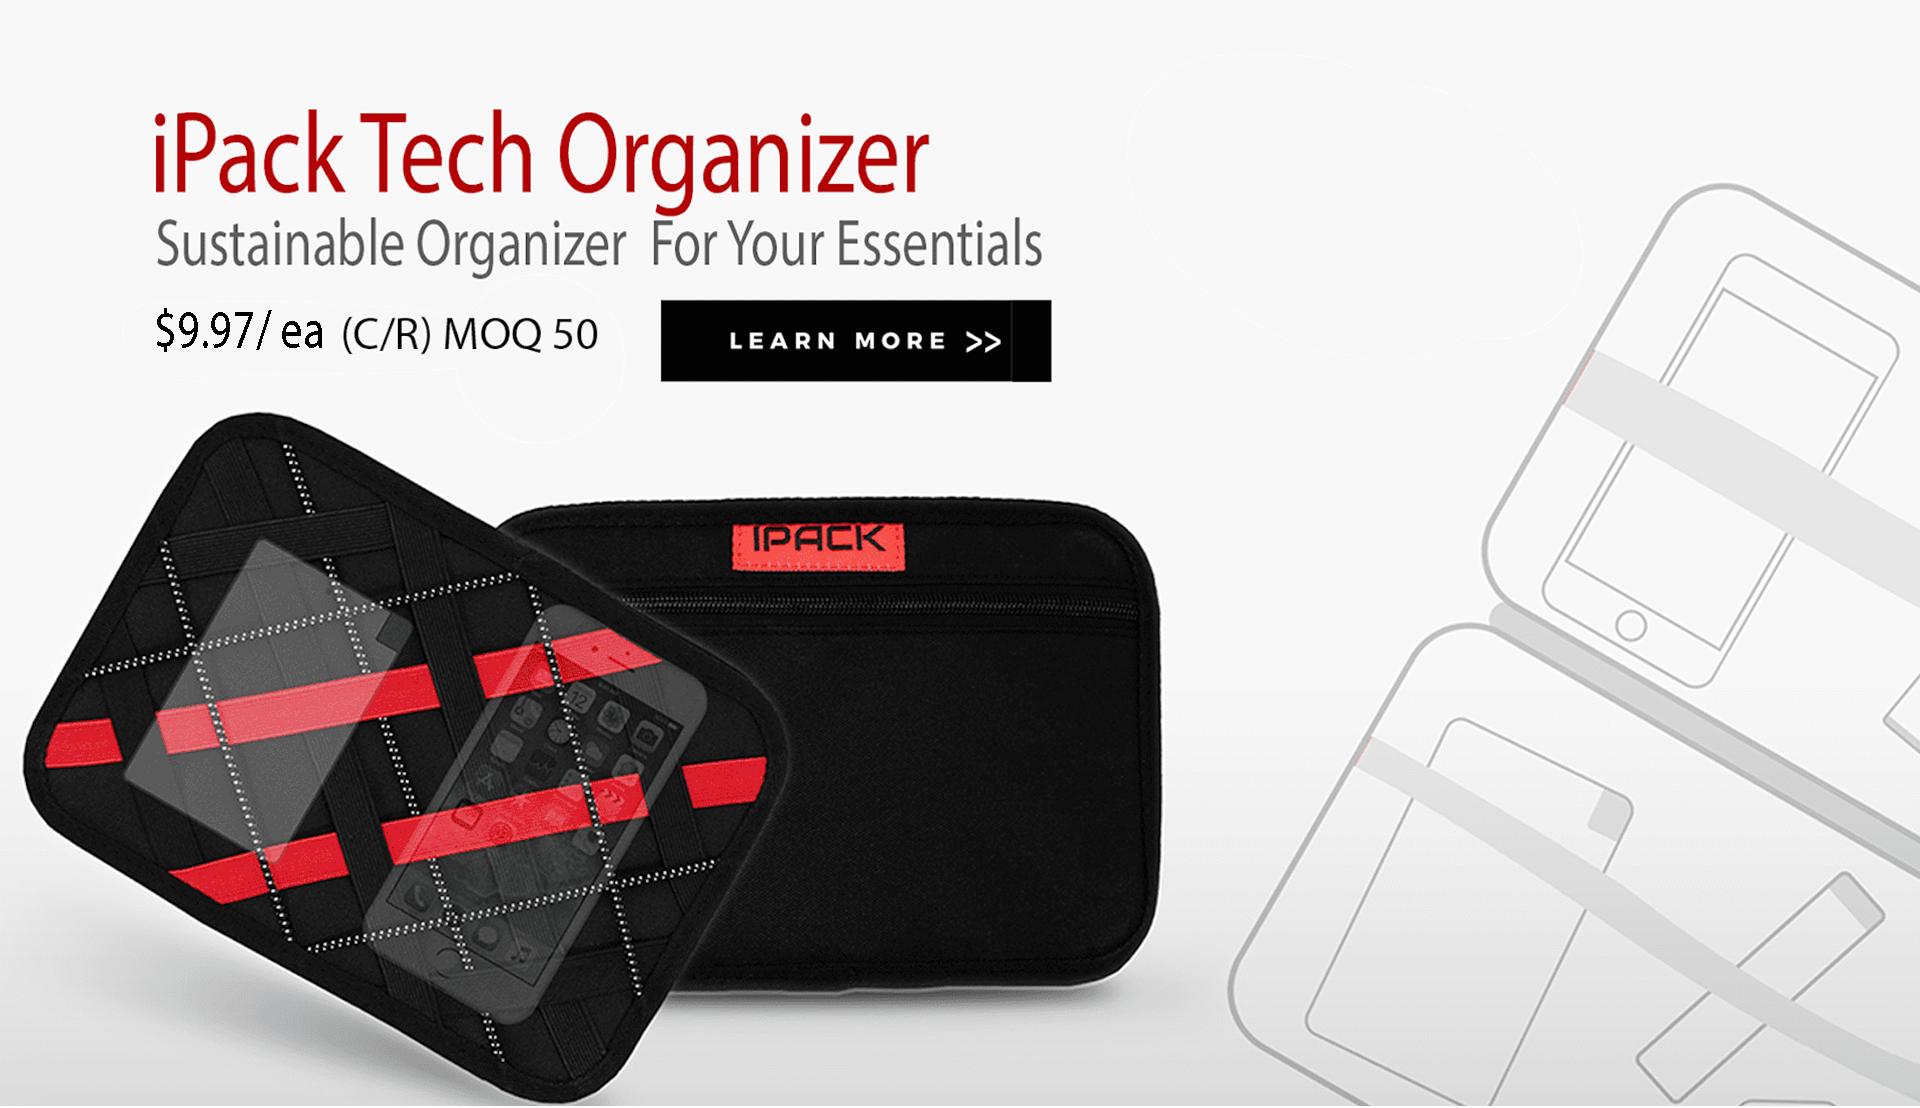 iPack Tech Organizer